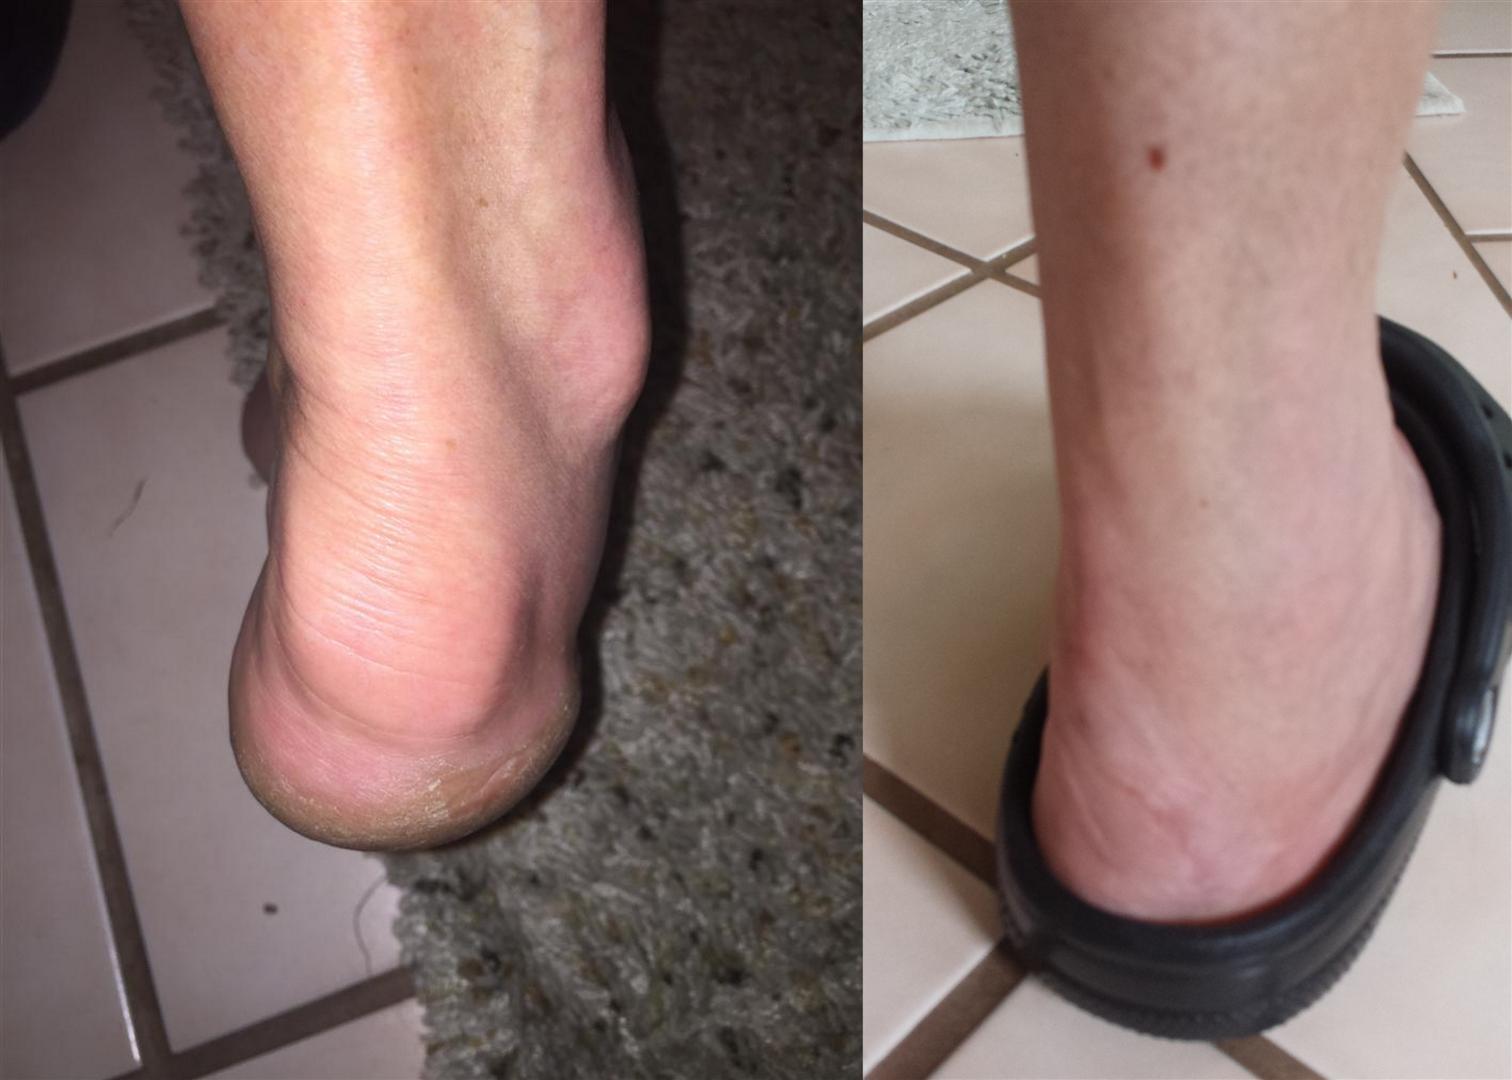 Foot before surgery and at 12 week anniversary